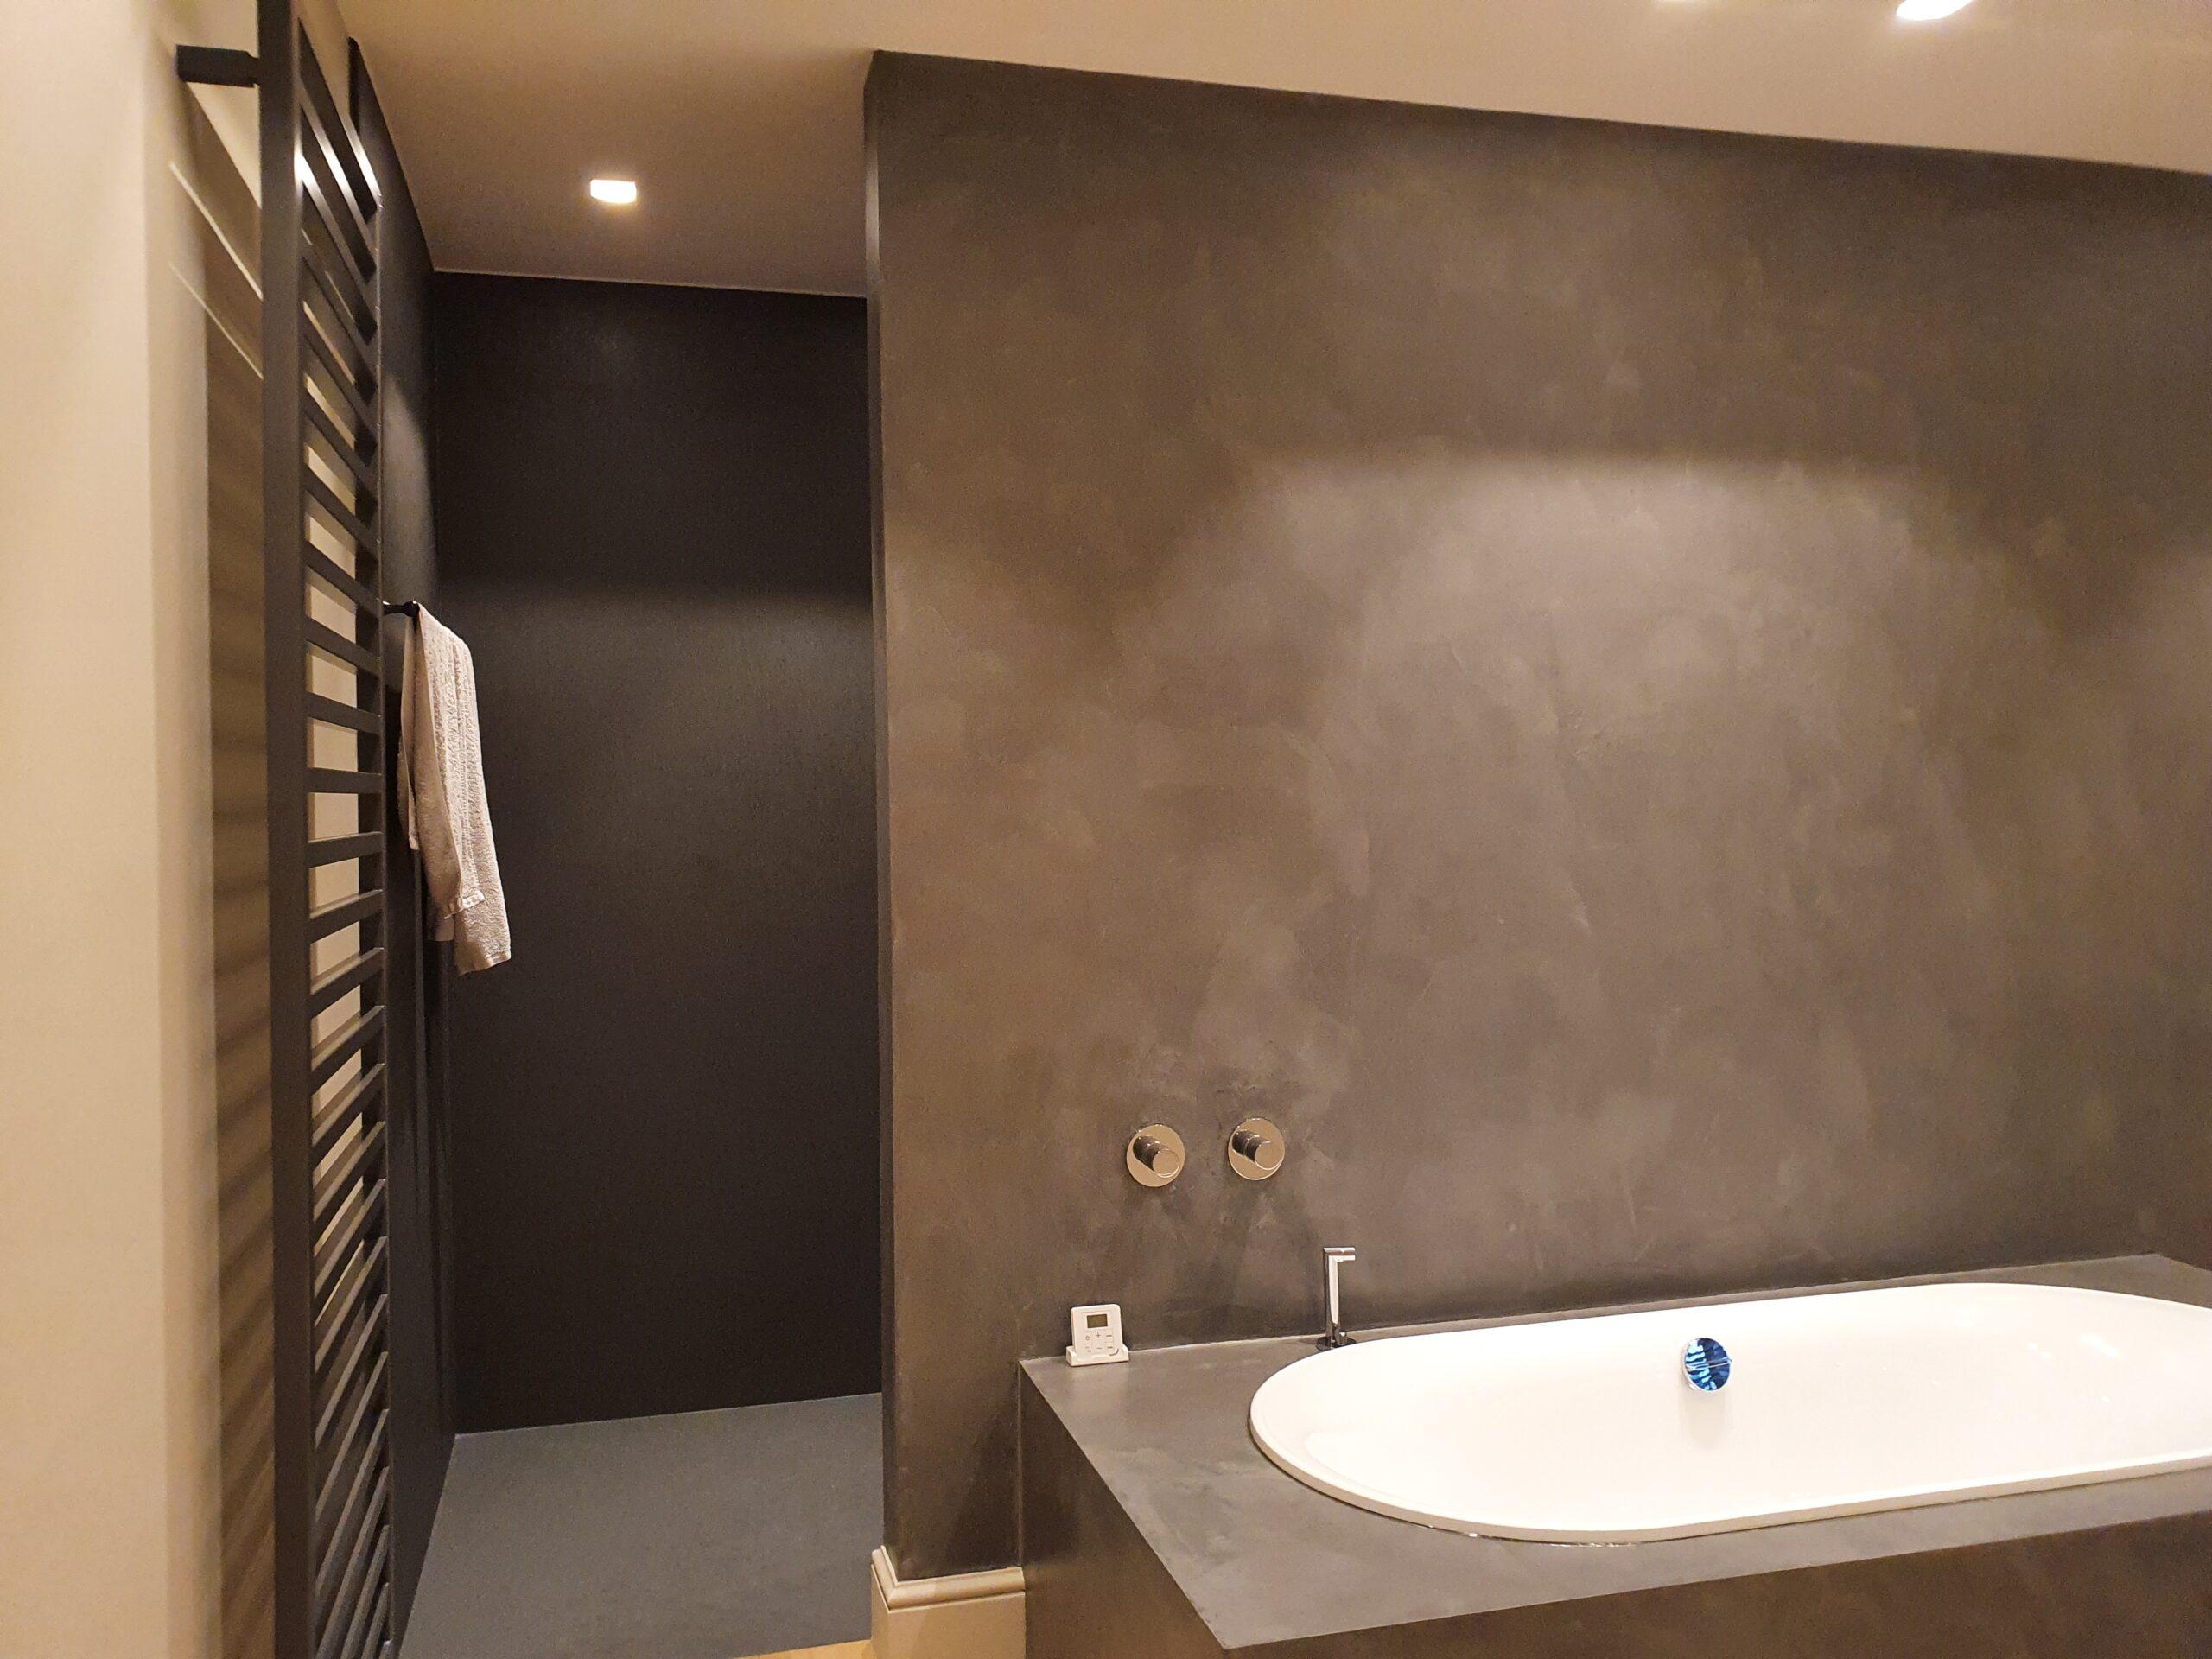 erasenzoon | beton-cire | betonstuc | betonreparatie | badkamer | trap | douche | vloer | muren | trappen